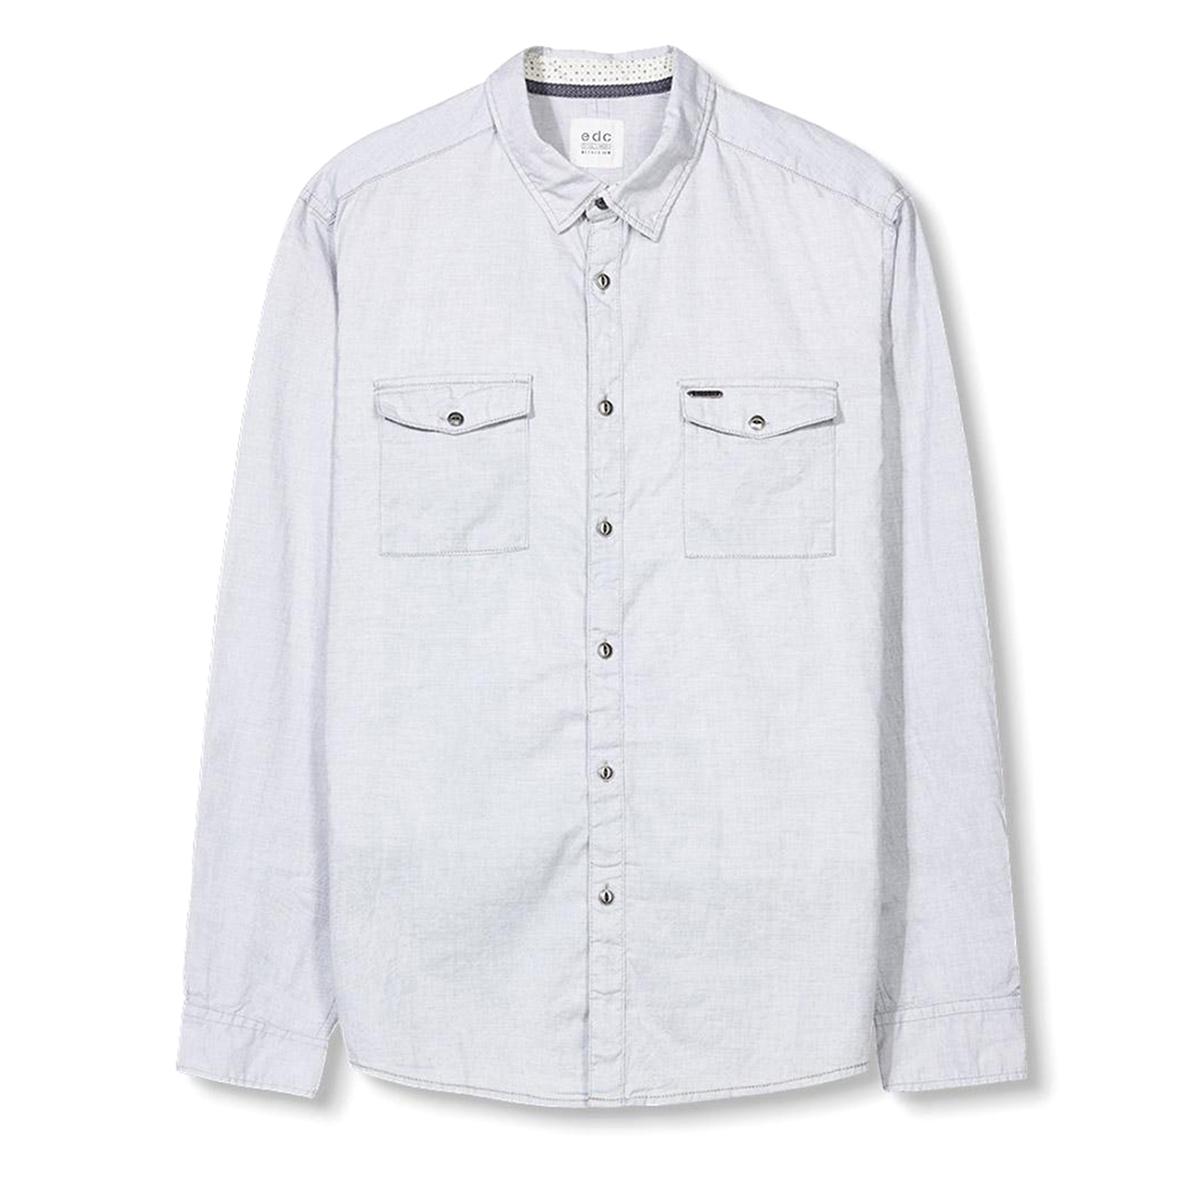 ESPRIT Рубашка из 100% хлопка